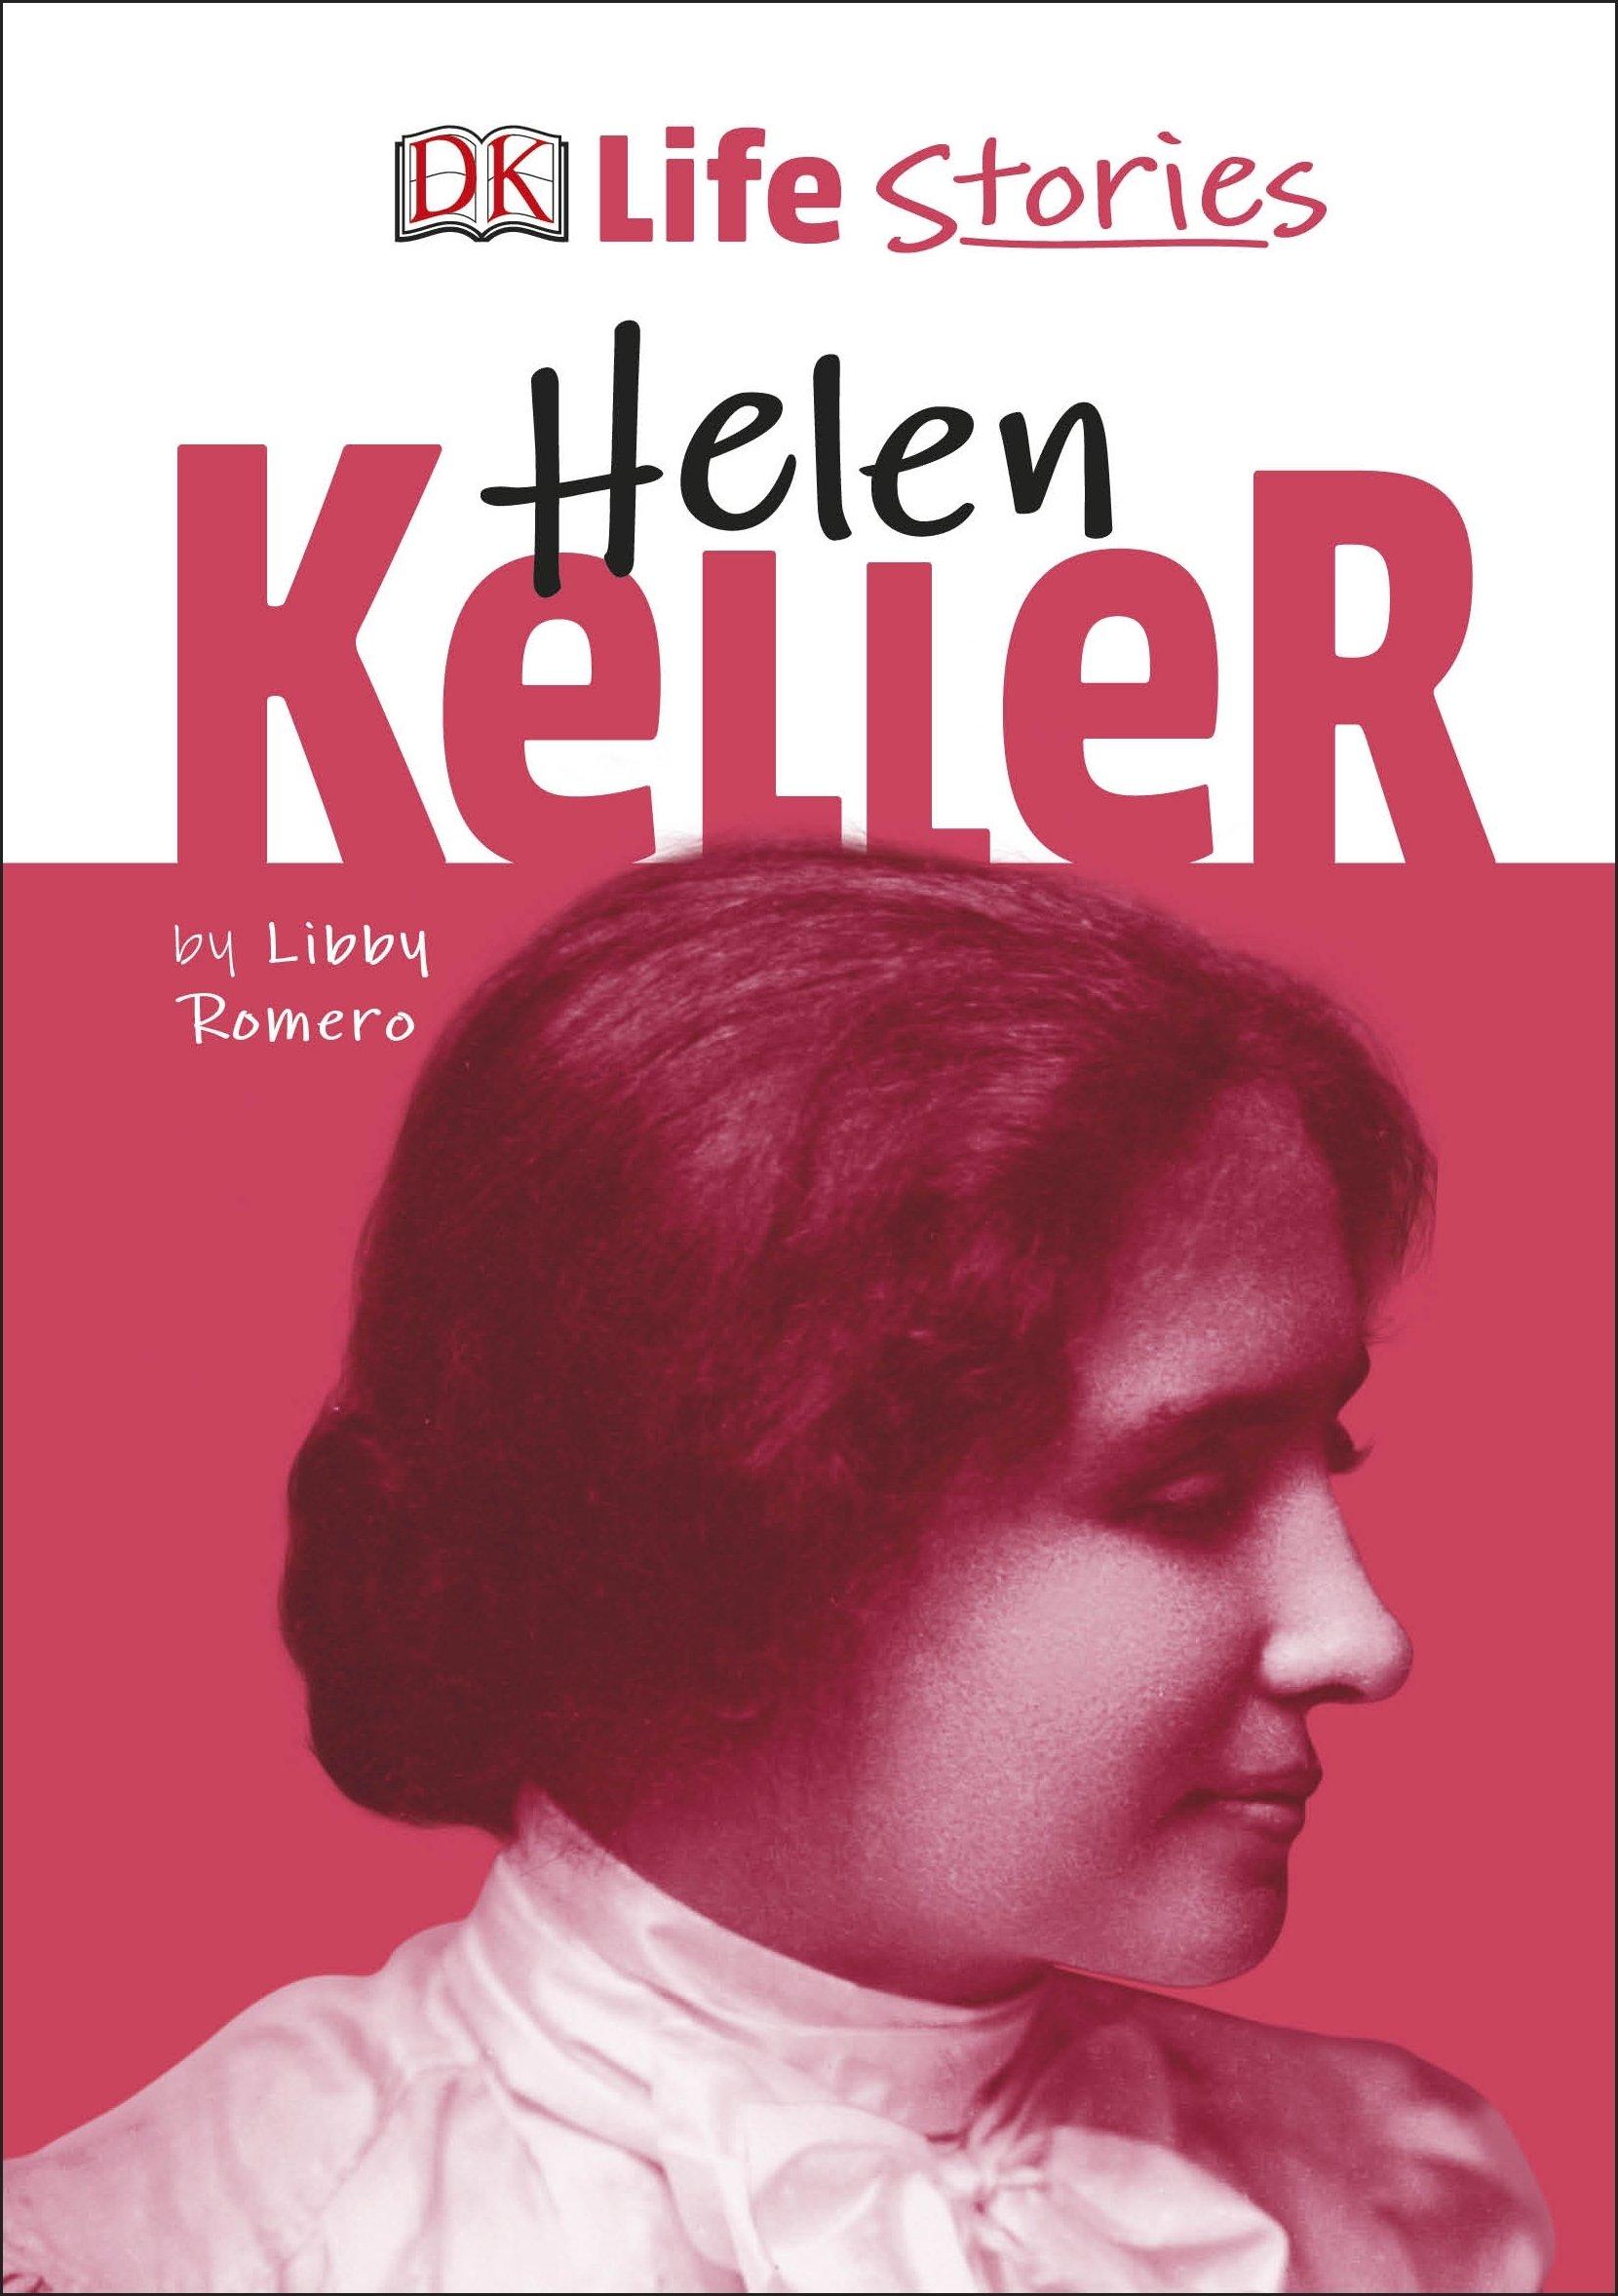 5303646105 DK Life Stories Helen Keller  Amazon.co.uk  Libby Romero